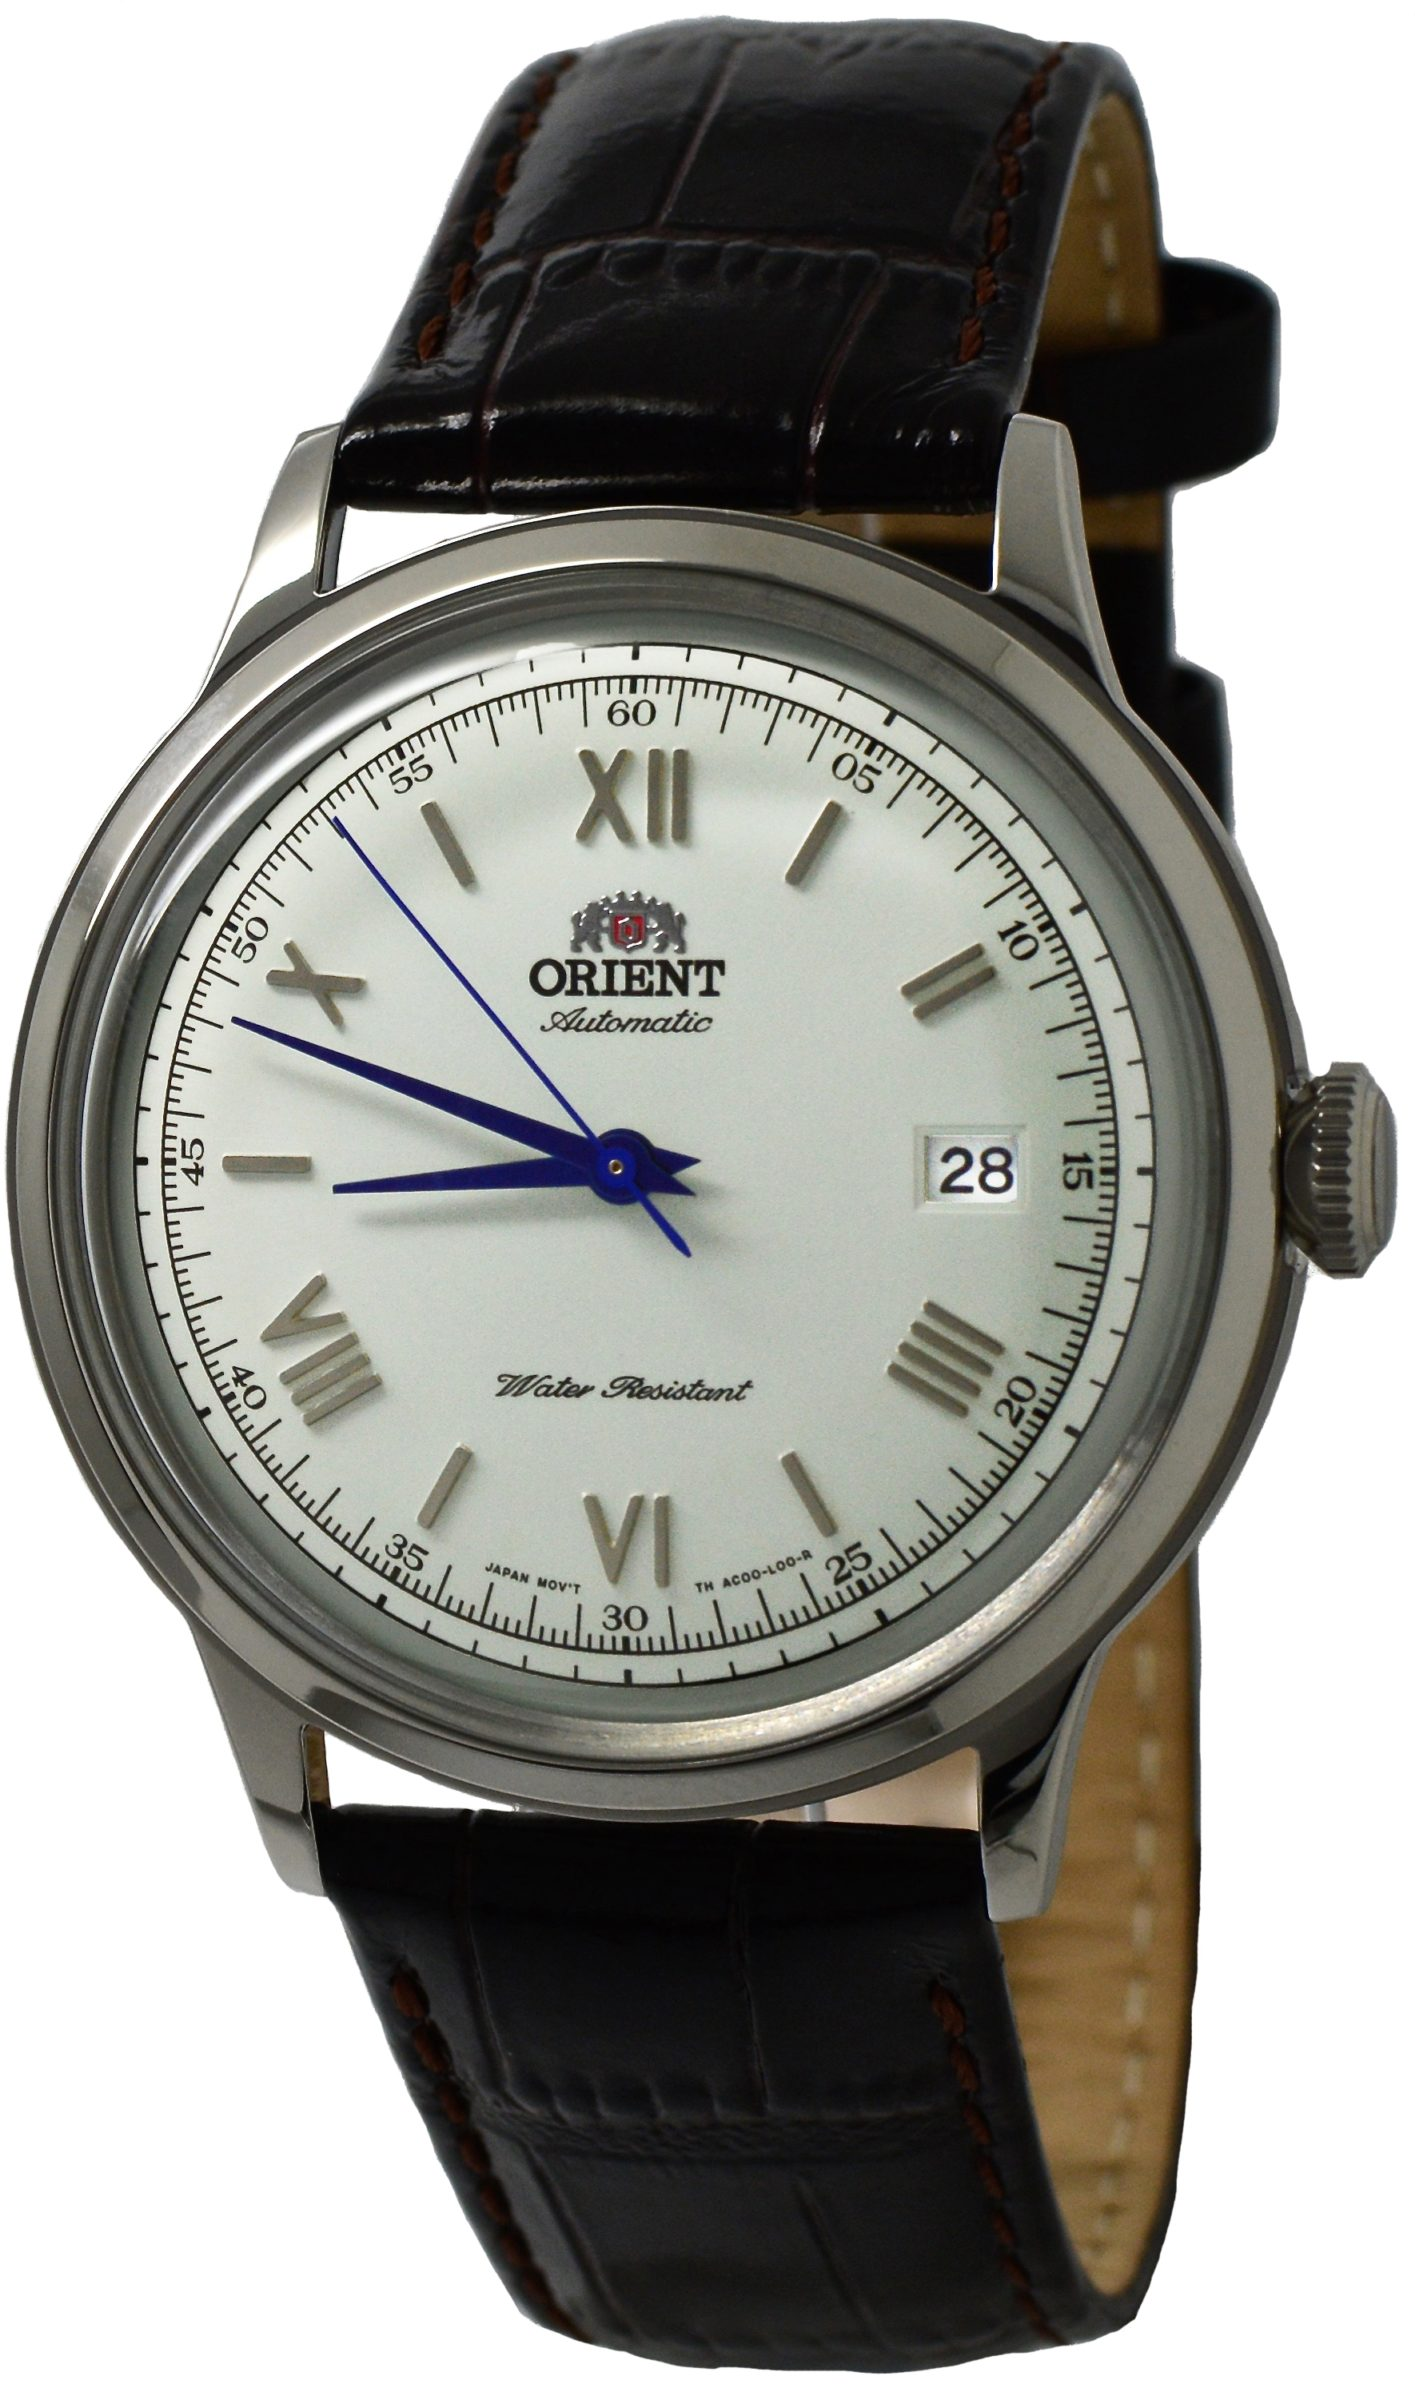 Orient 2nd Generation Bambino Mens Watch 2 1